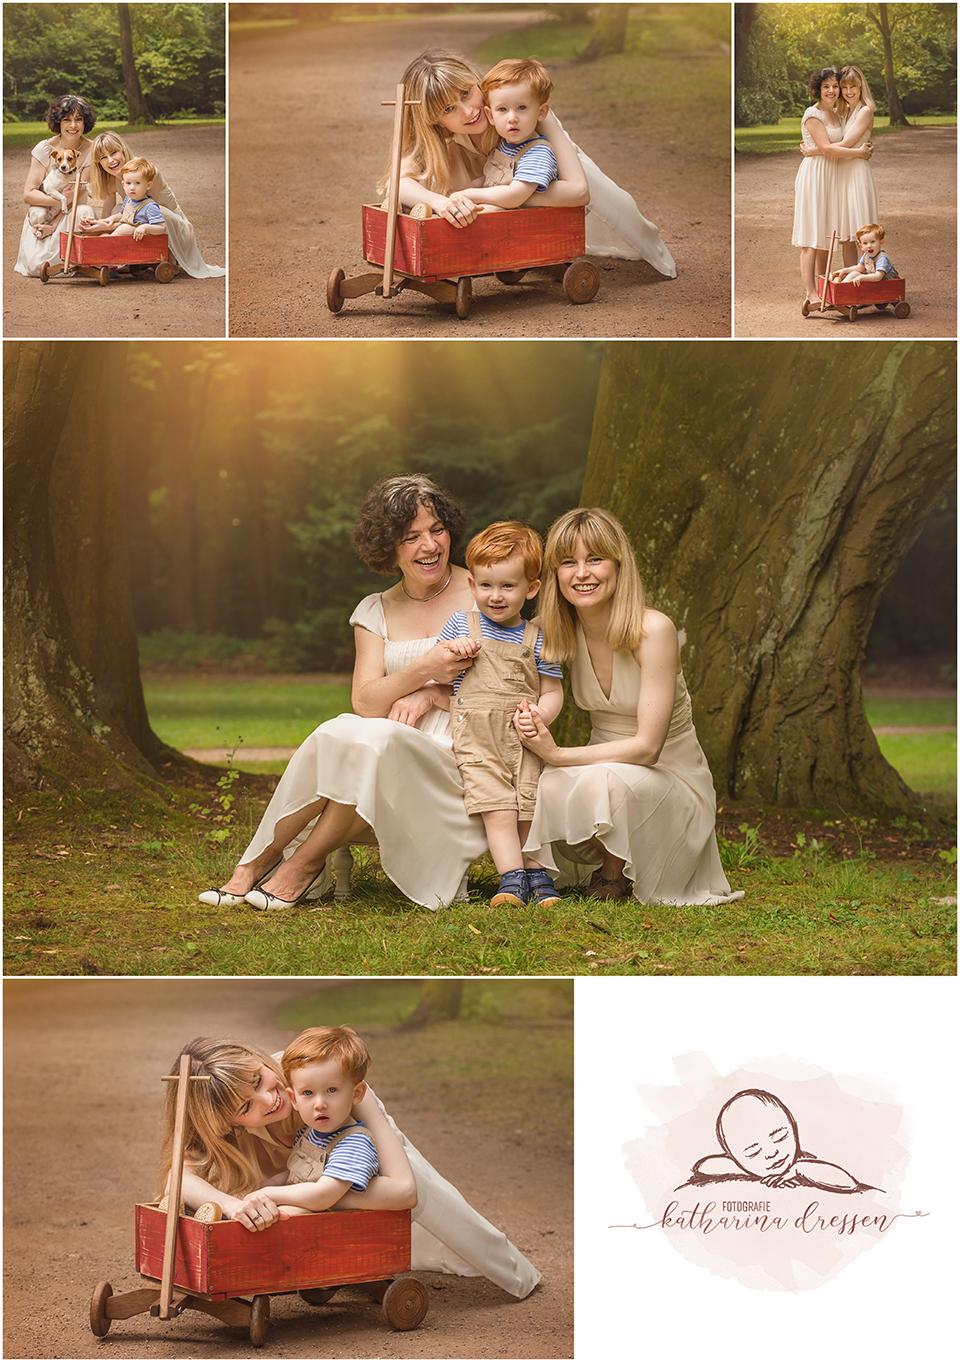 4_Familien-Fotoshooting_Familienbilder_Familienfotograf_Moenchengladbach_Kinder-Fotograf_Kinder-draussen-fotografieren